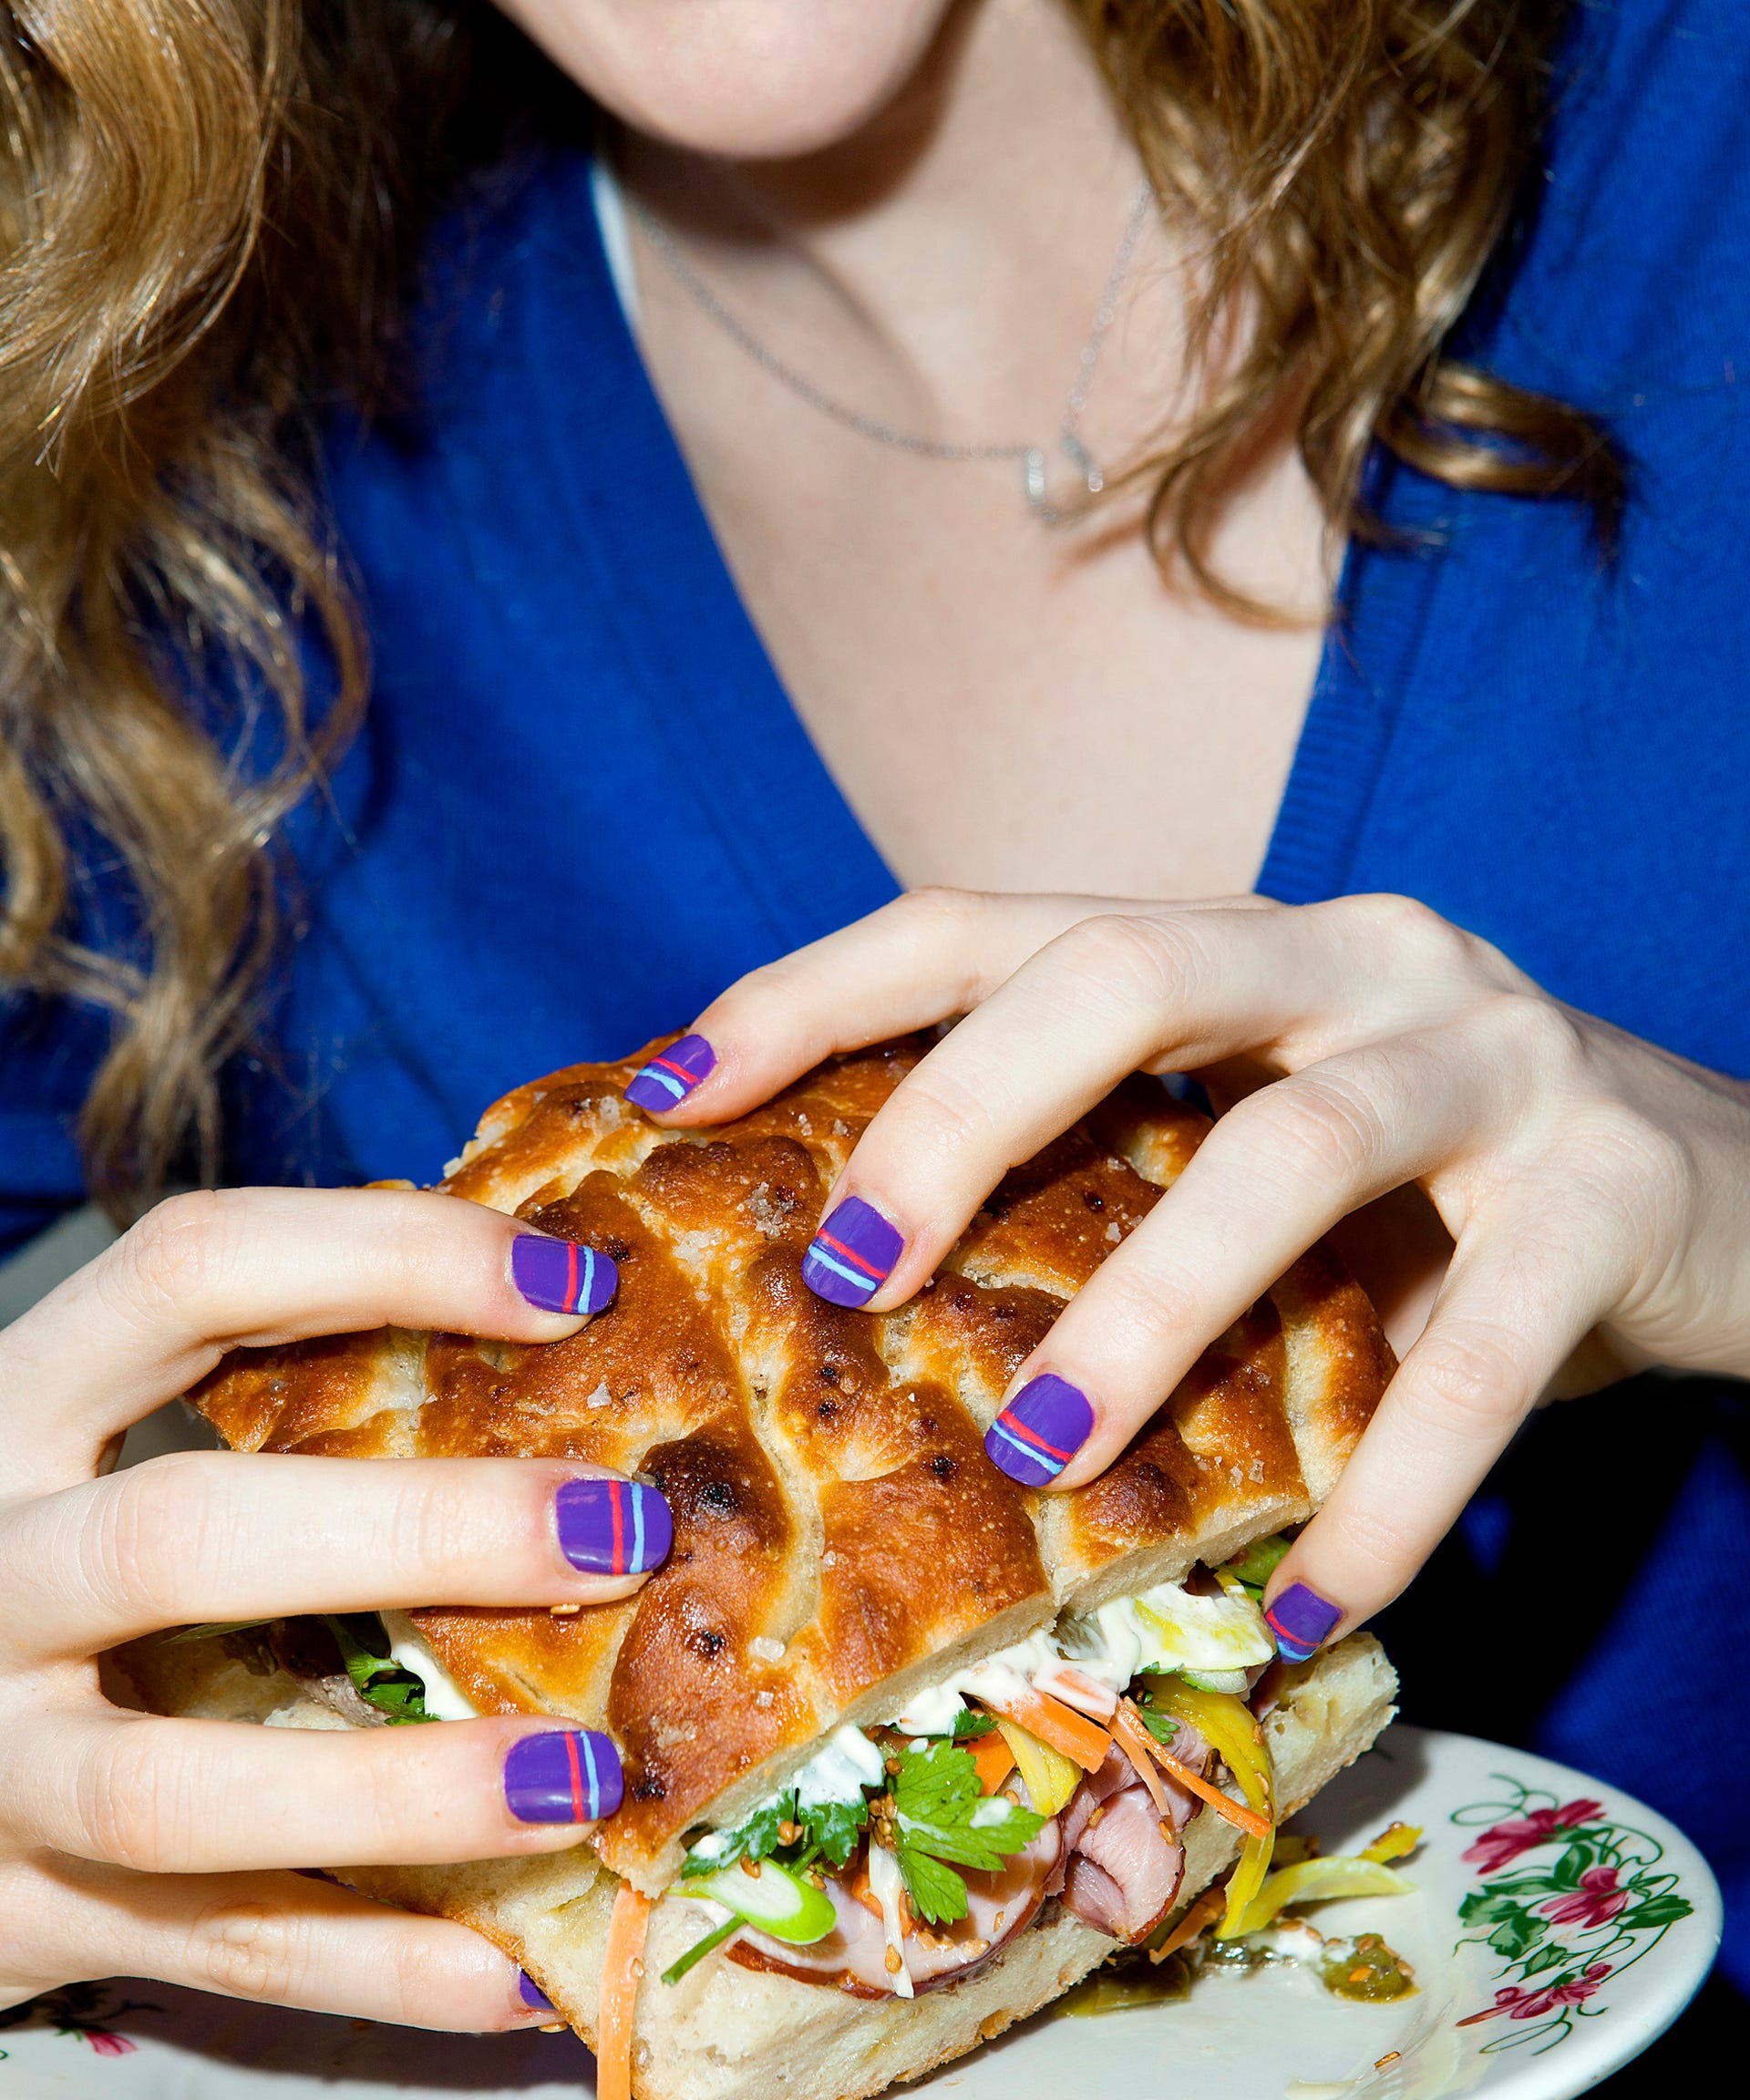 eating-alone-op